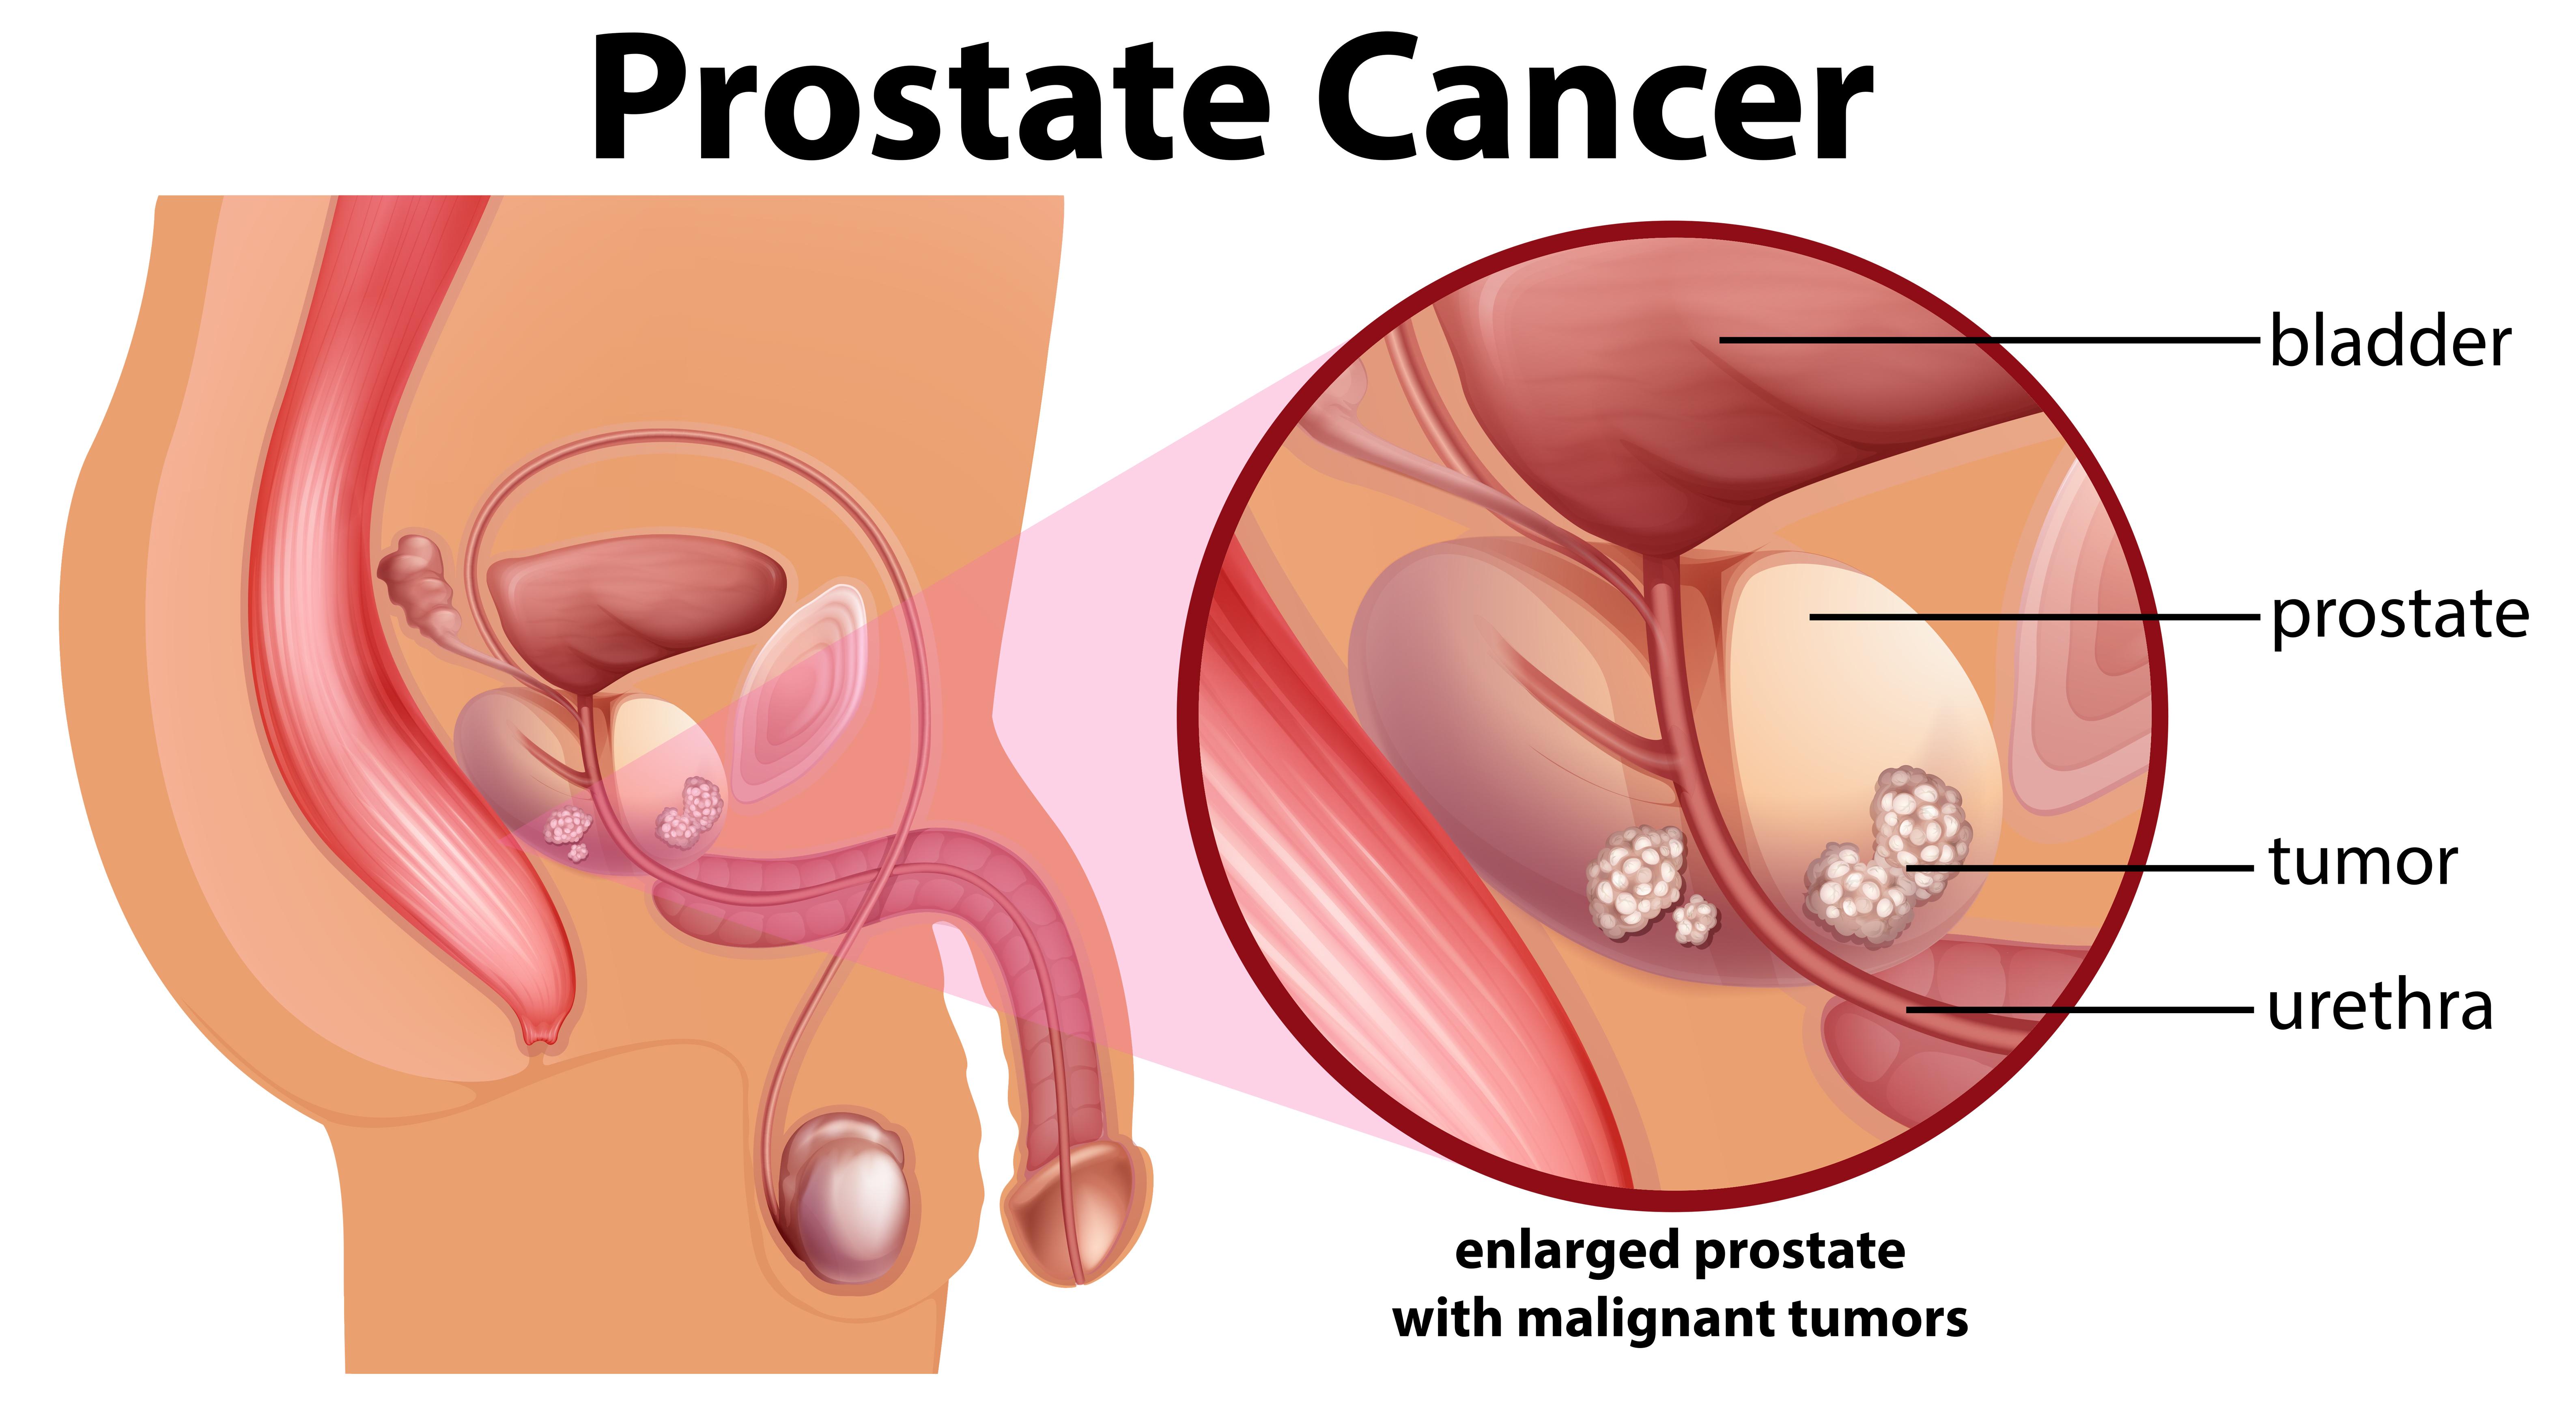 cáncer de próstata animación